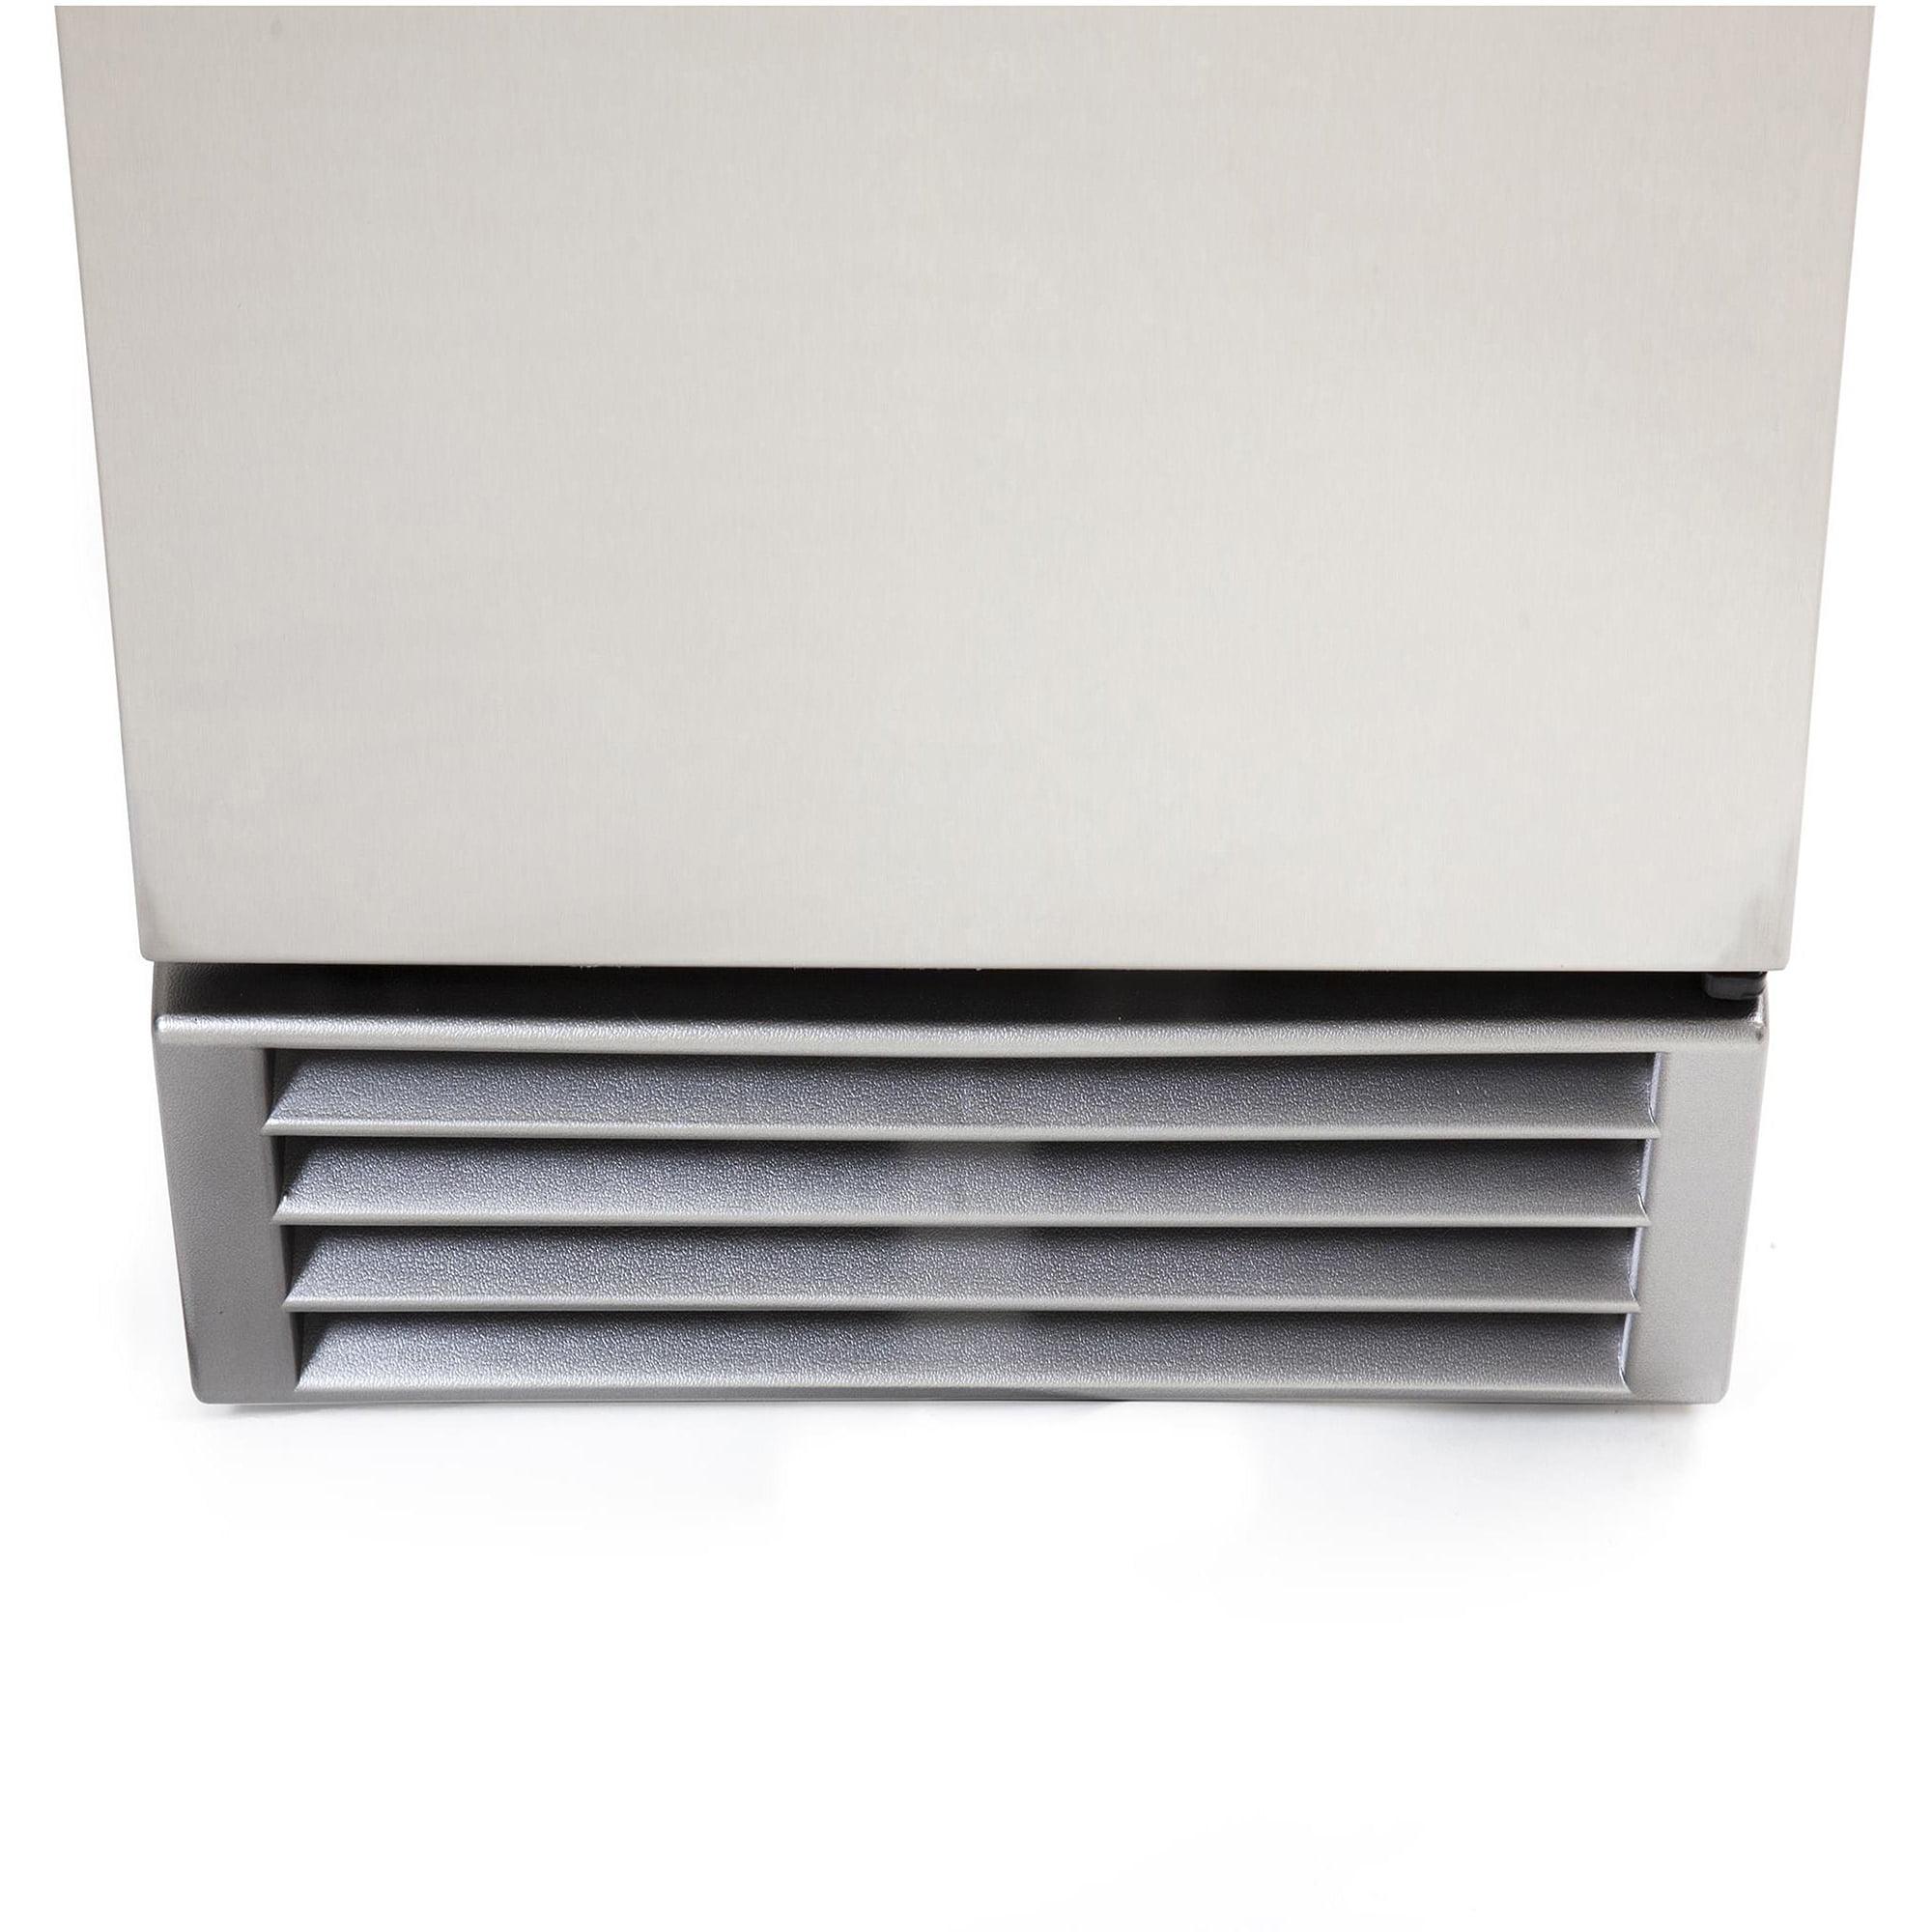 Whynter BOR-325FS Stainless Steel Indoor/Outdoor Beverage Refrigerator, 3.2 cu ft